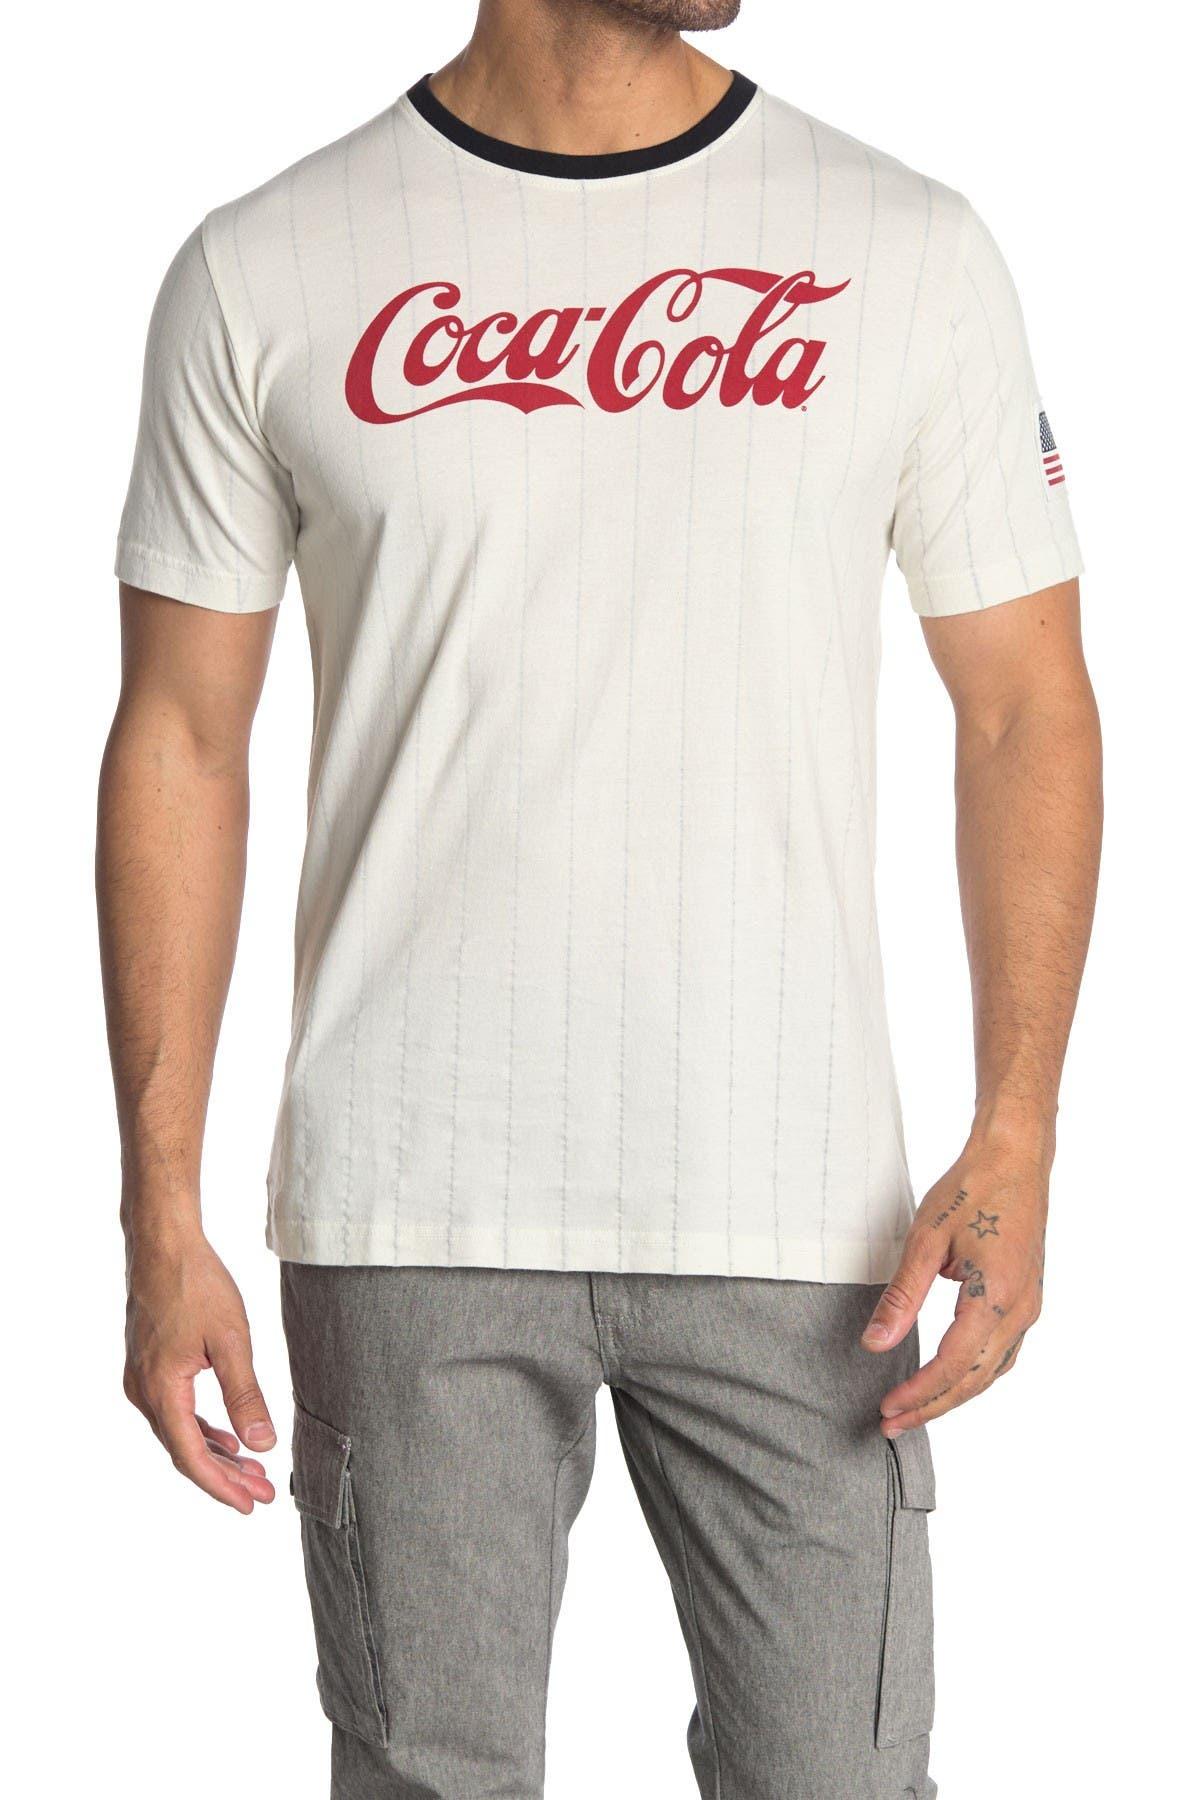 Image of American Needle Remote Control Coca-Cola T-Shirt